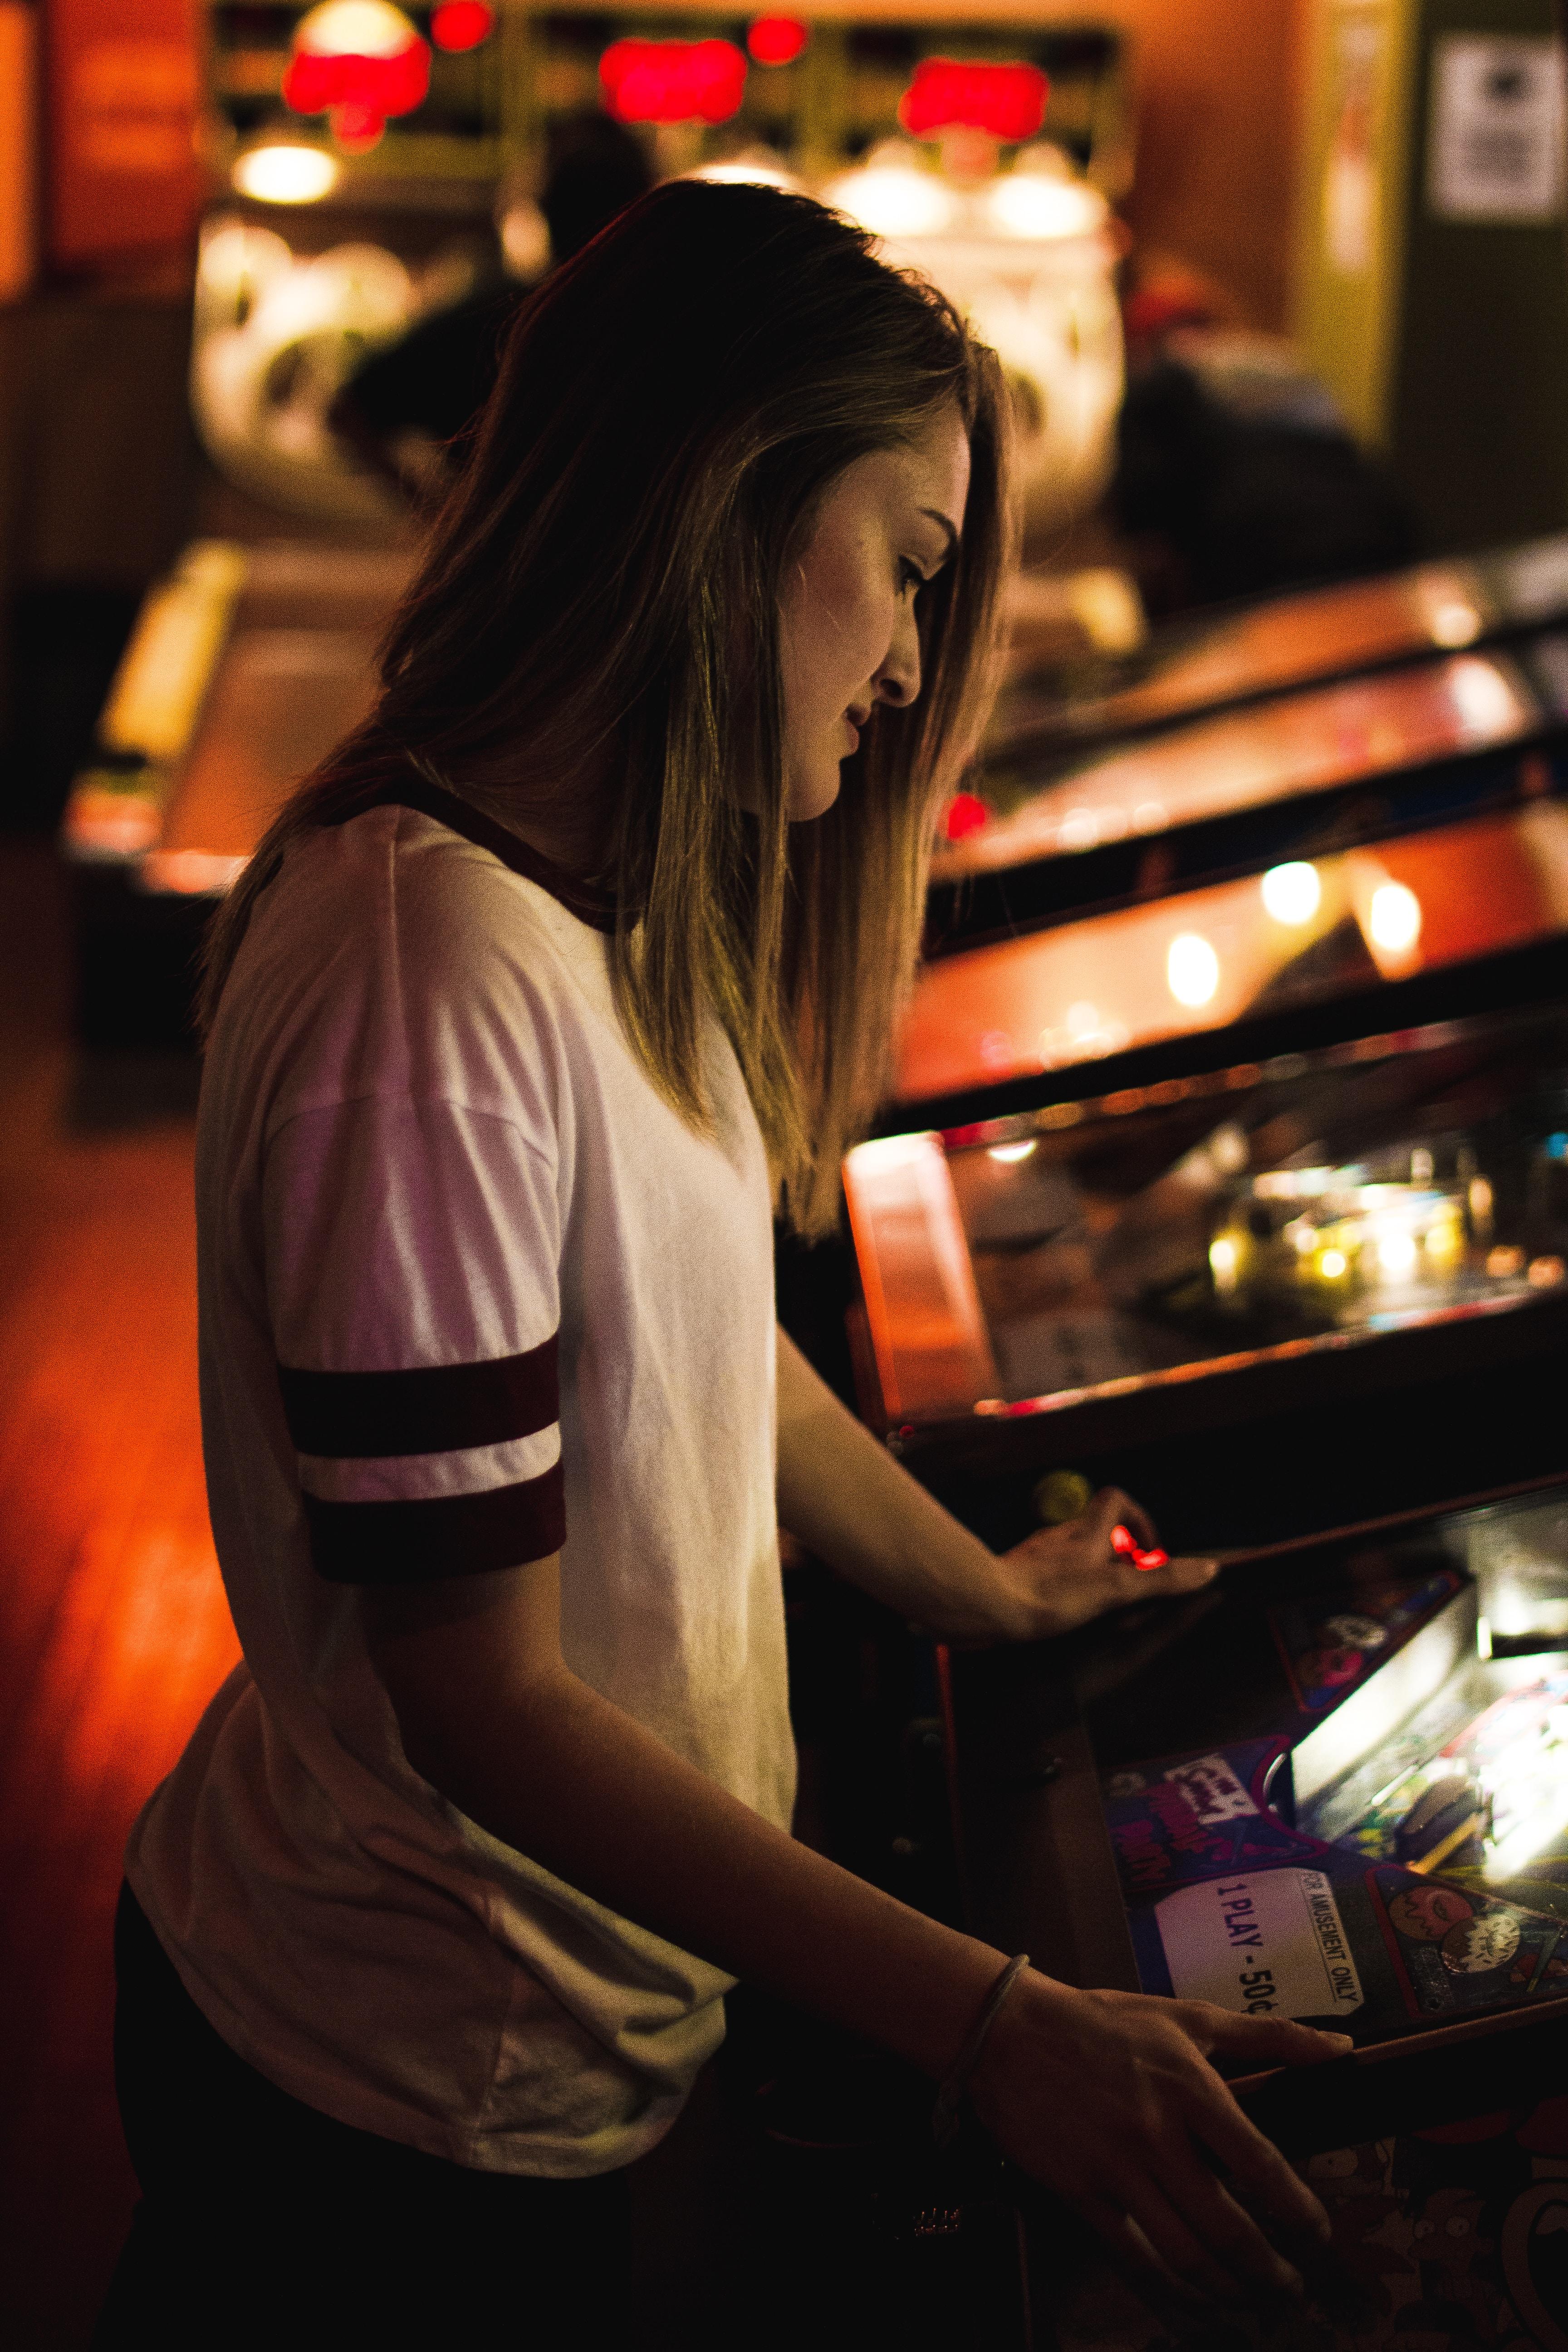 A woman with medium-length brown hair plays a game in an arcade